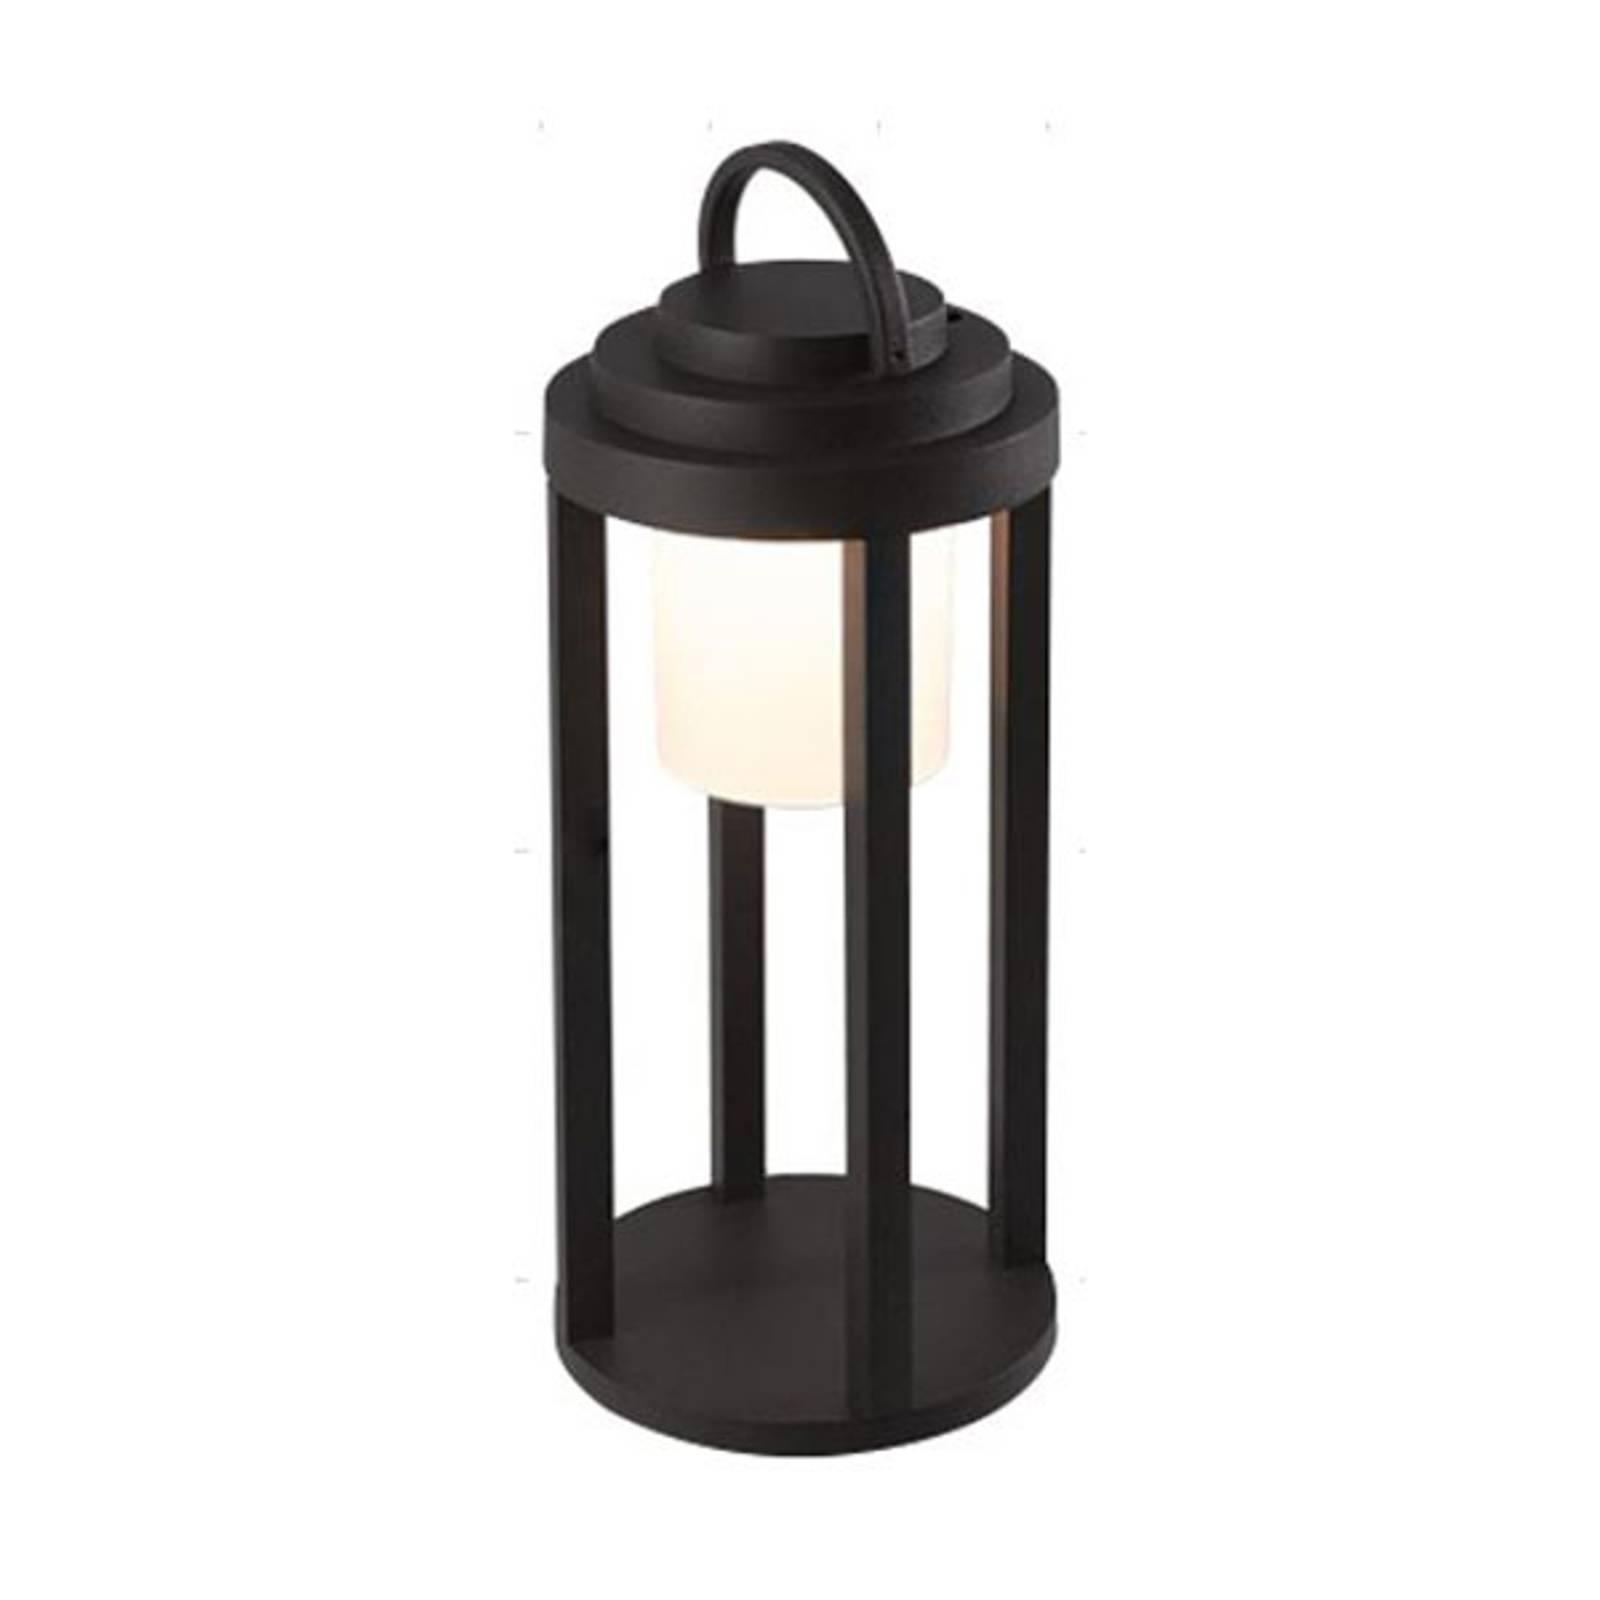 Lampada LED batteria esterni Kalimnos, nero, 35 cm